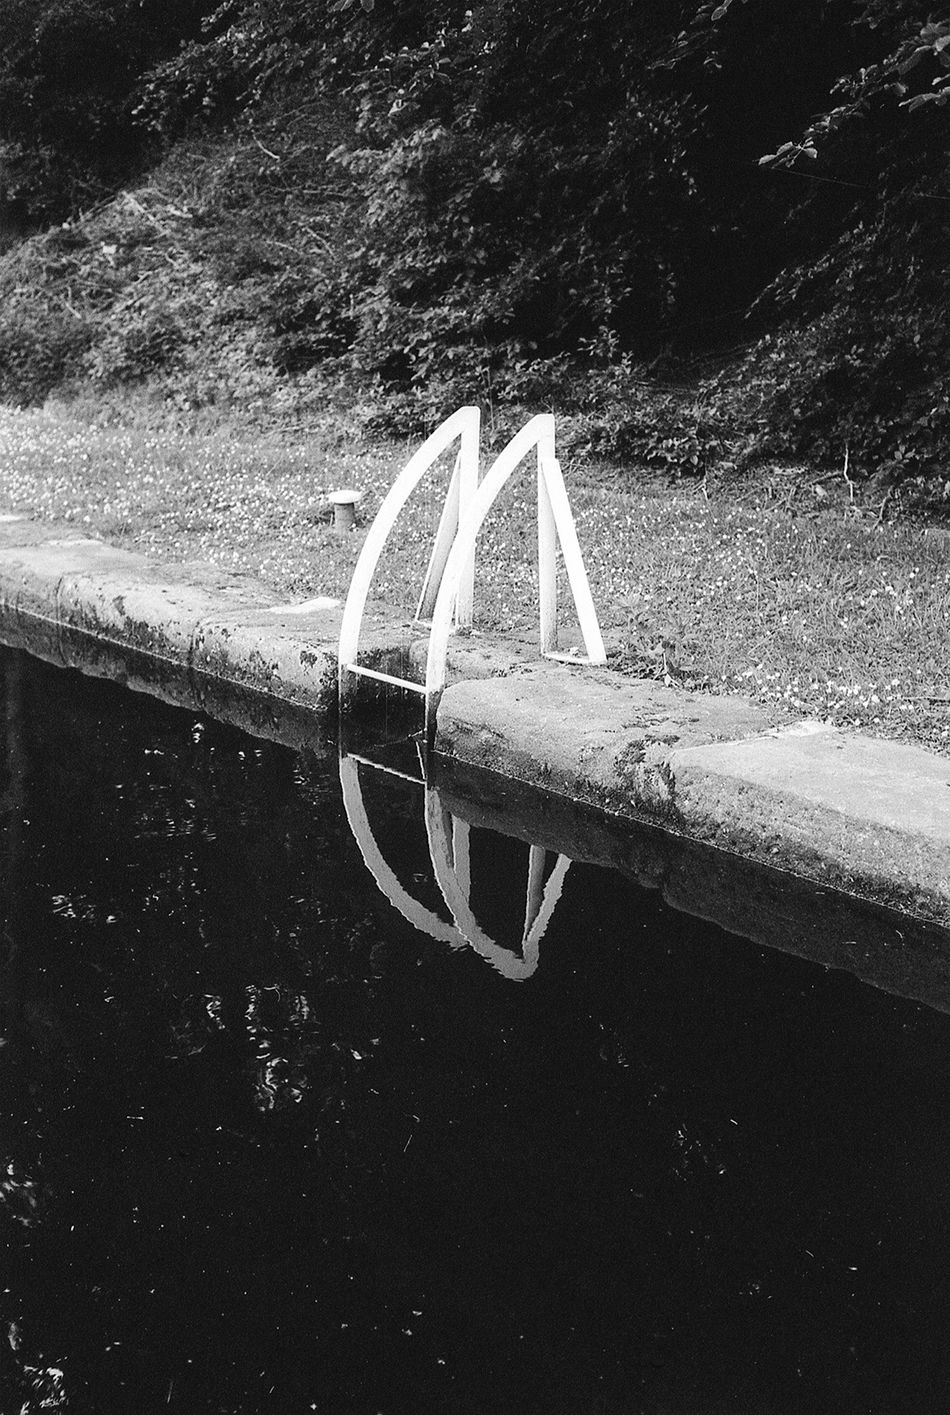 Monochrome Blackandwhite Analogue Photography Film Photography Fomapan100 Reflection Water Reflections Water No People Fine Art Photography Monochrome Photography